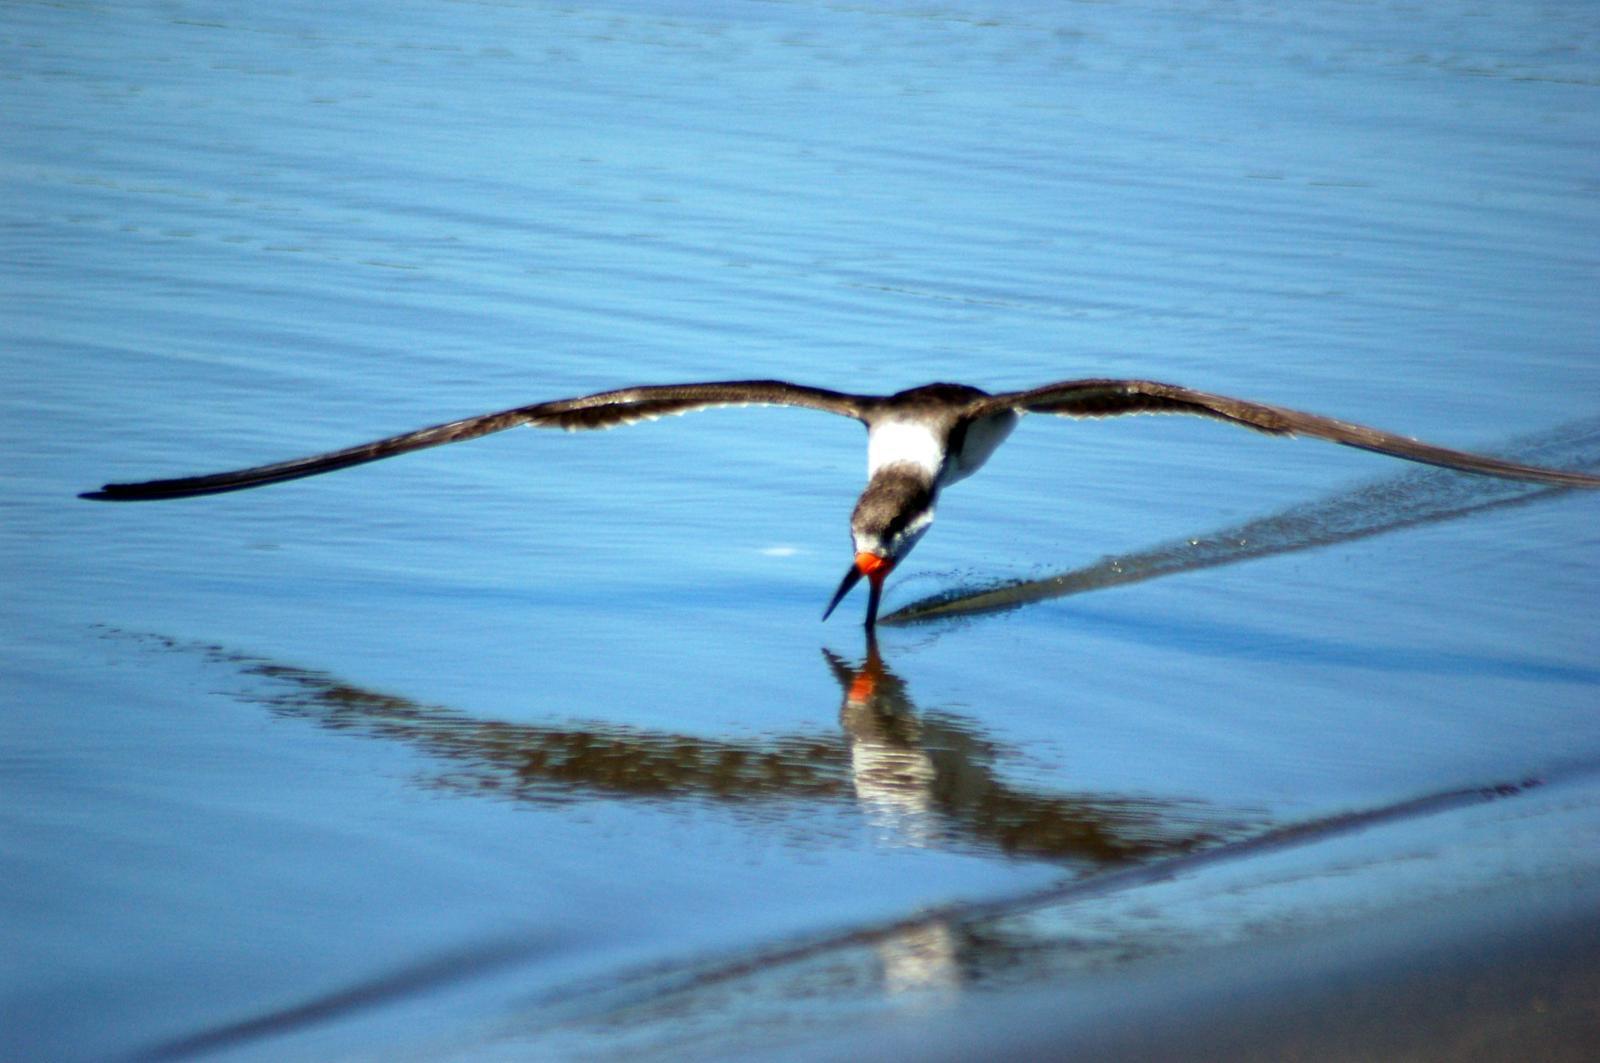 Black Skimmer Photo by Carlos Silva-Quintas